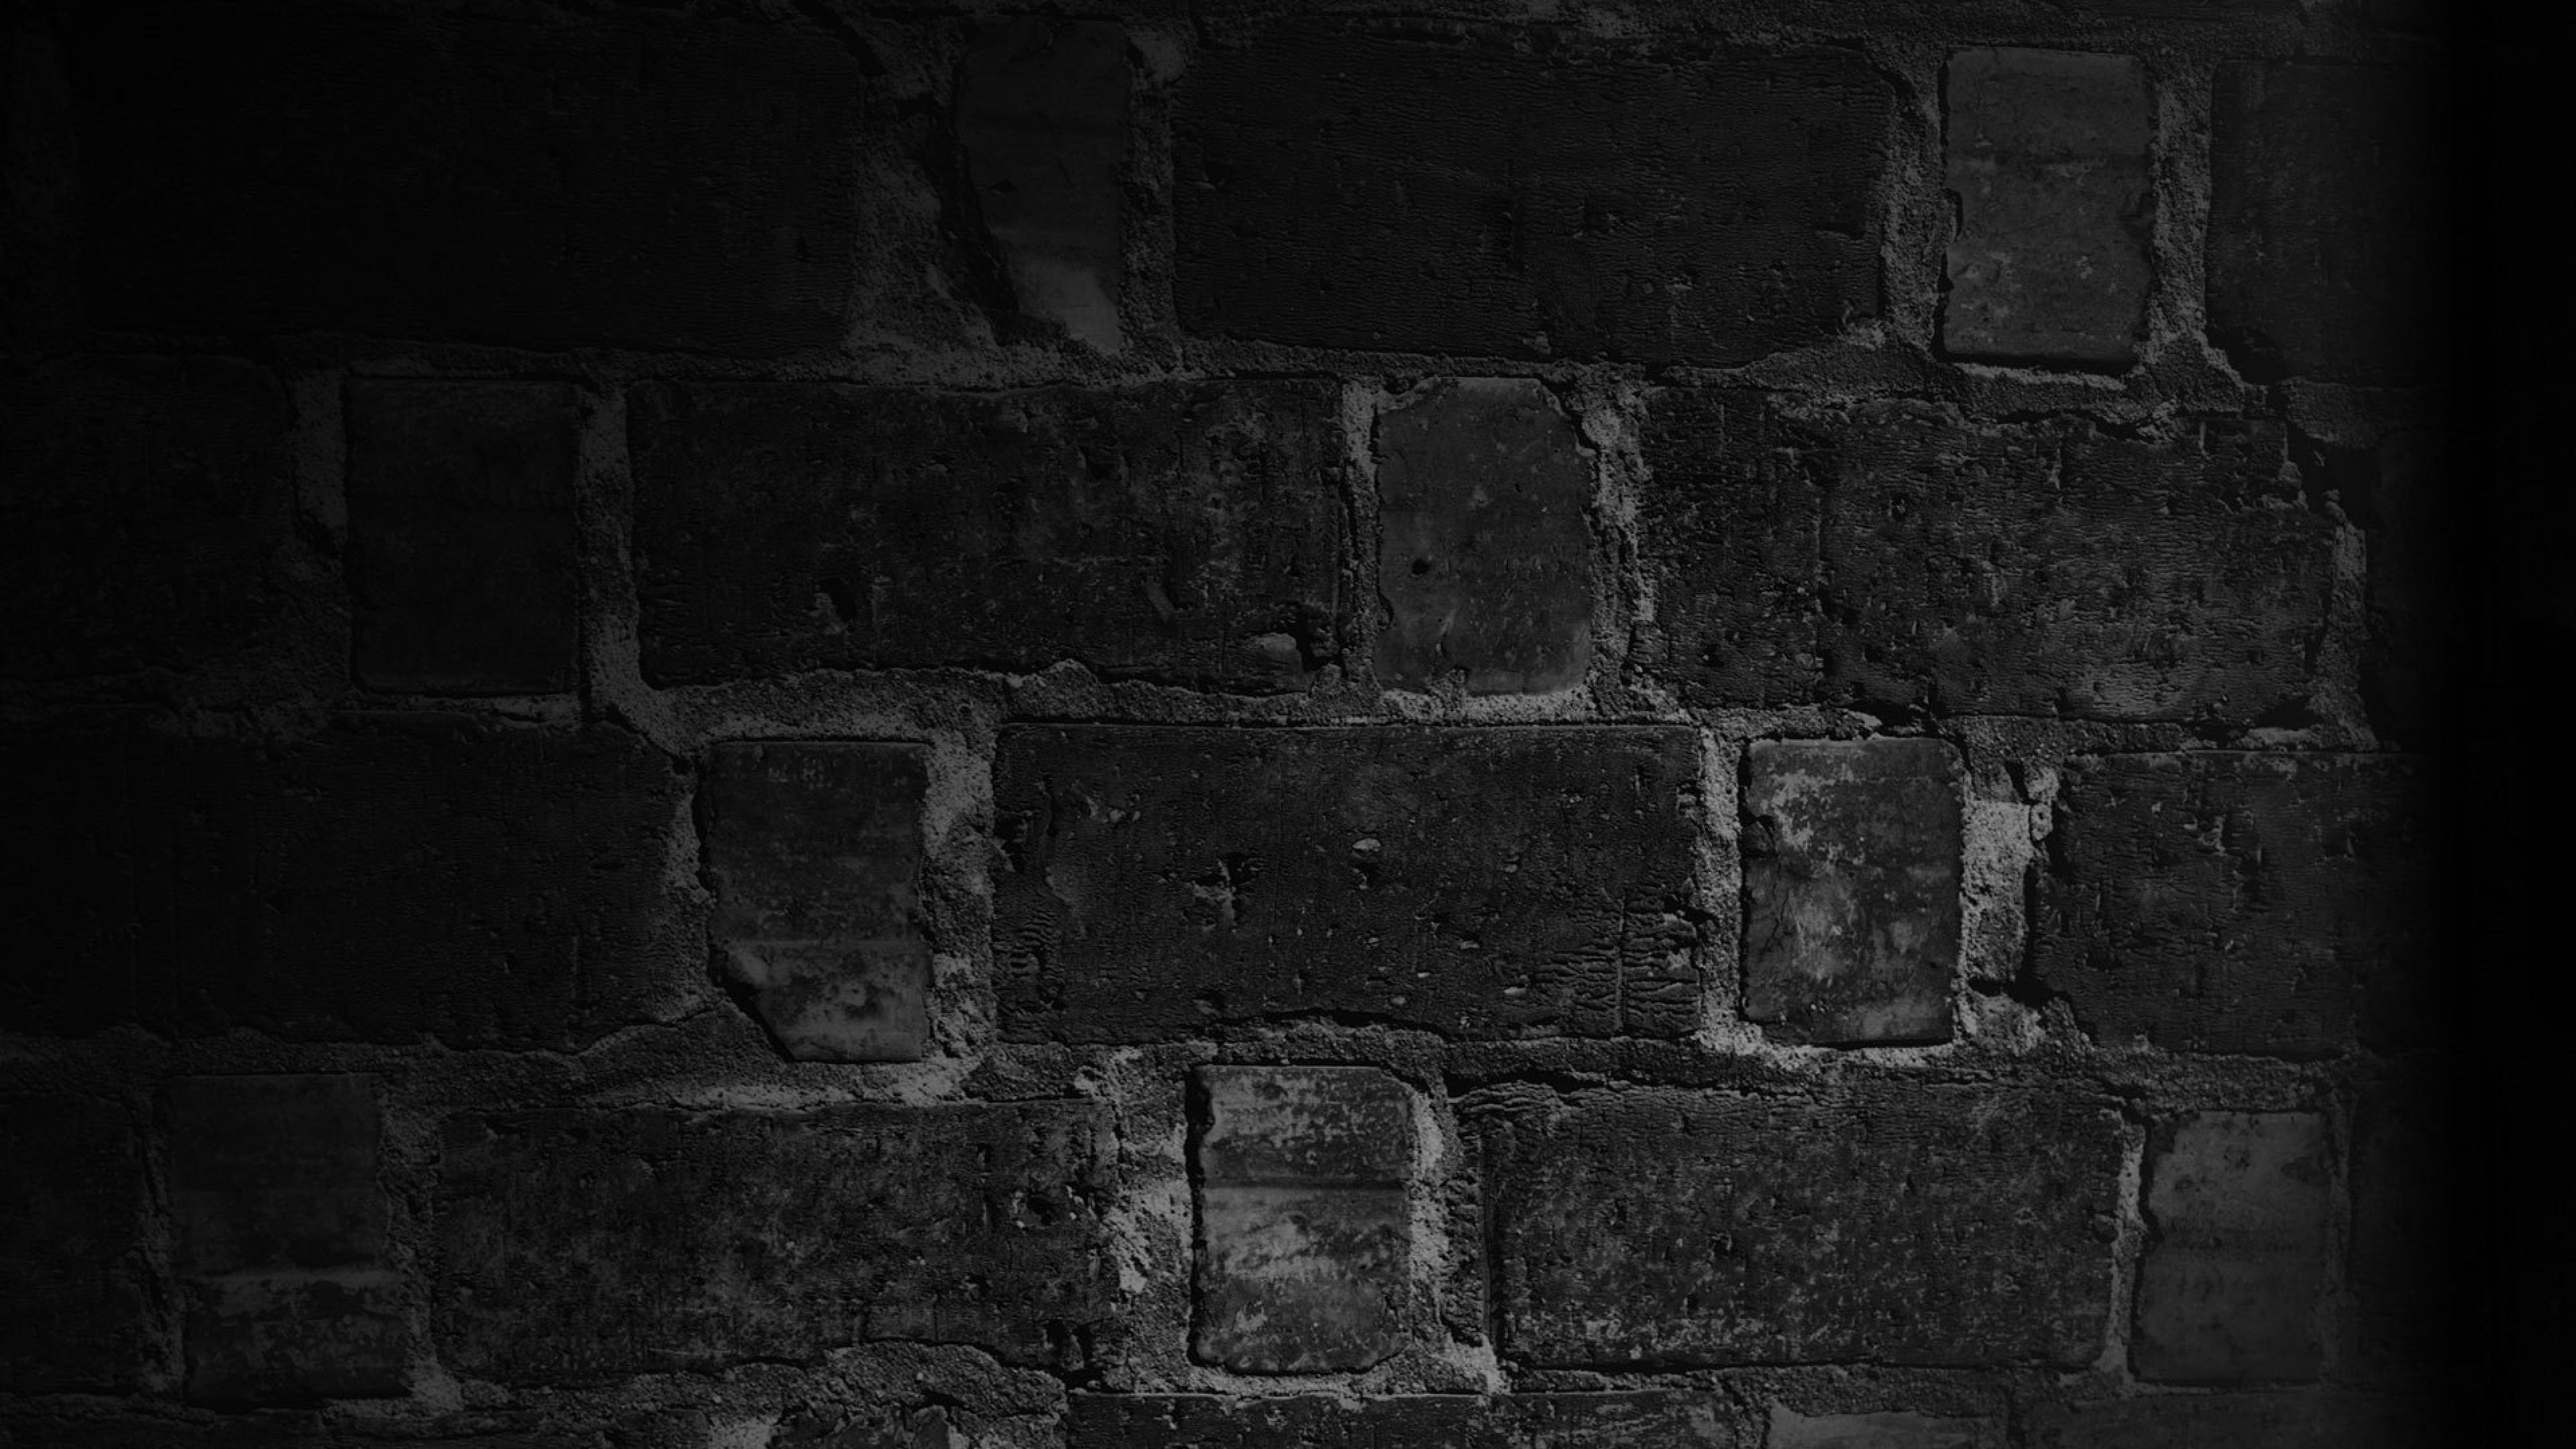 Balck And White Wallpaper: 4K Black And White Wallpaper